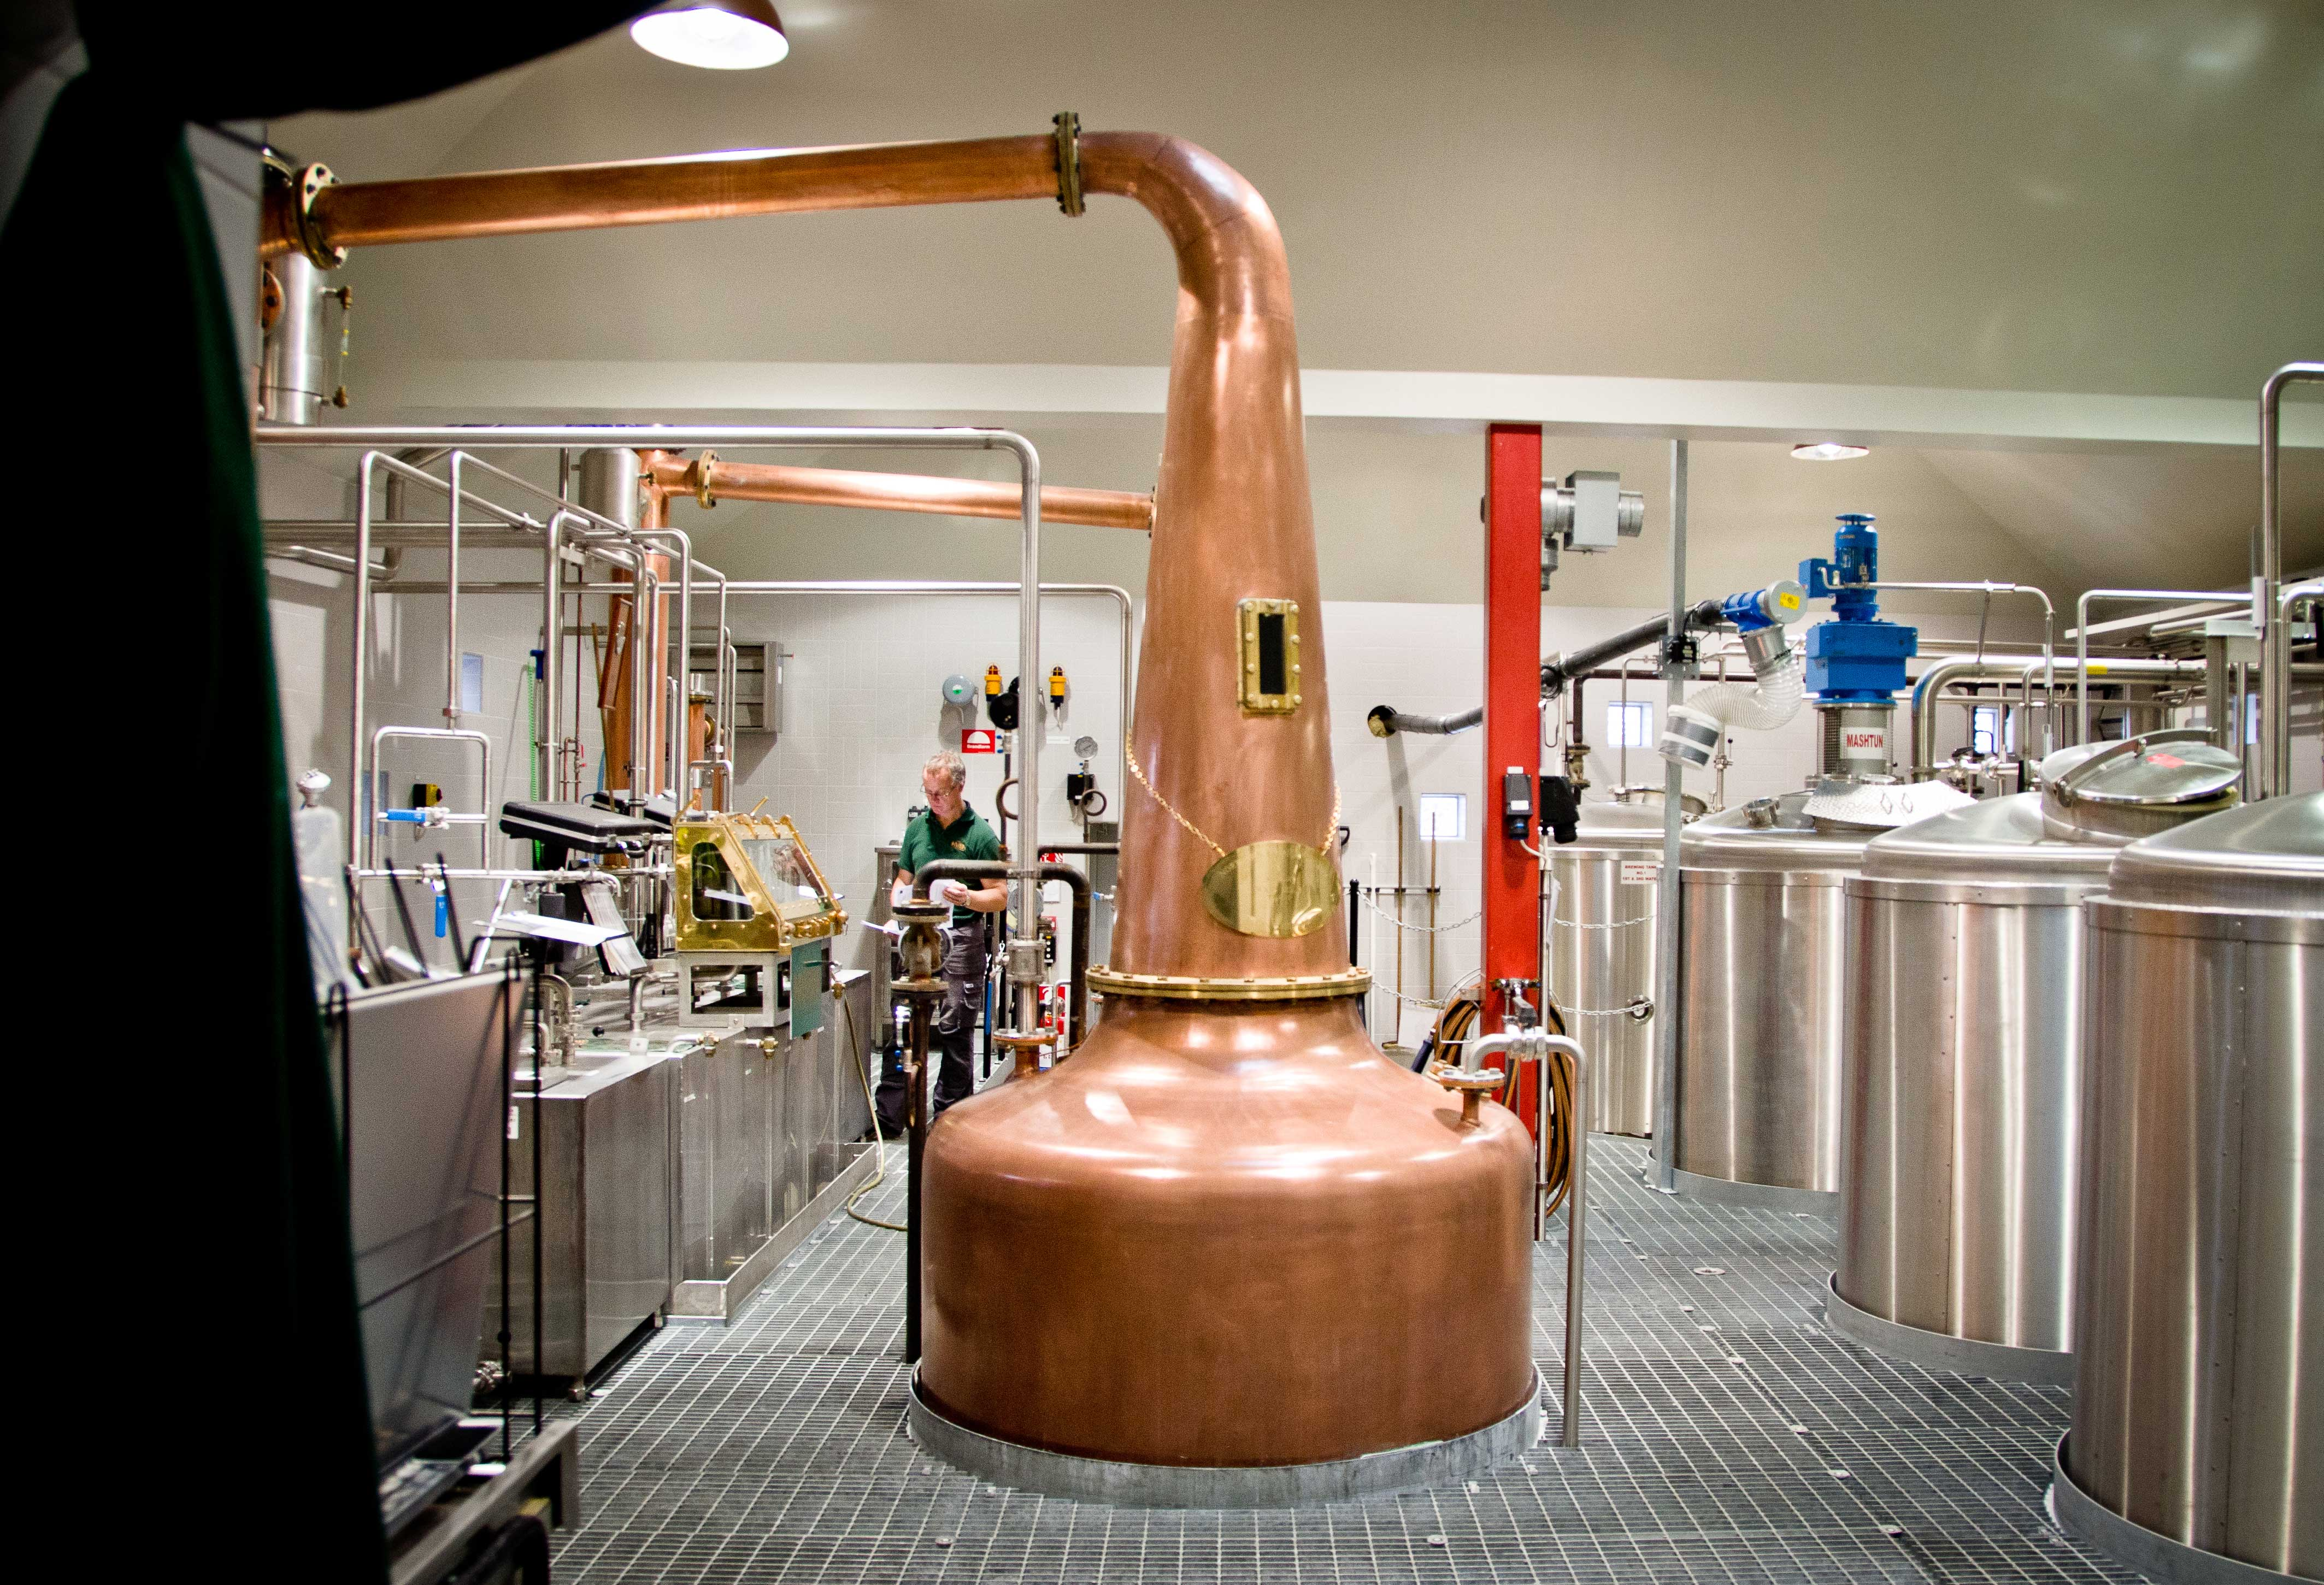 Backafallsbyn distillery